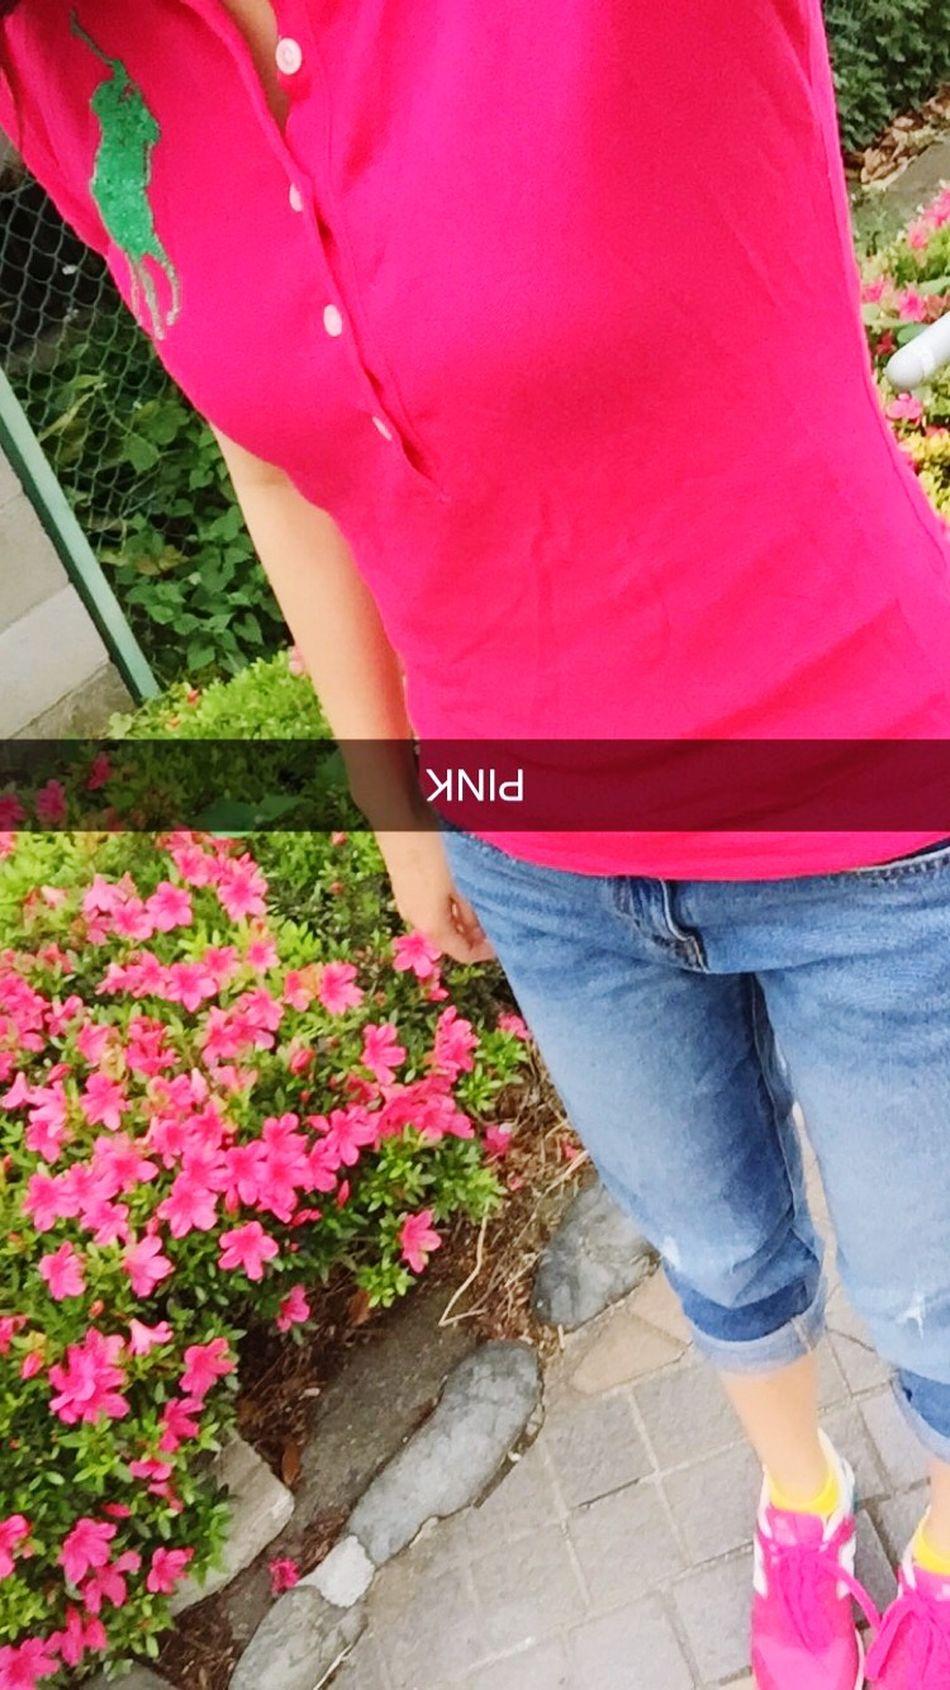 PINK Coordinates Pink Todaycoordinate Polo Ralph Lauren NewBalance Flower Comesummre